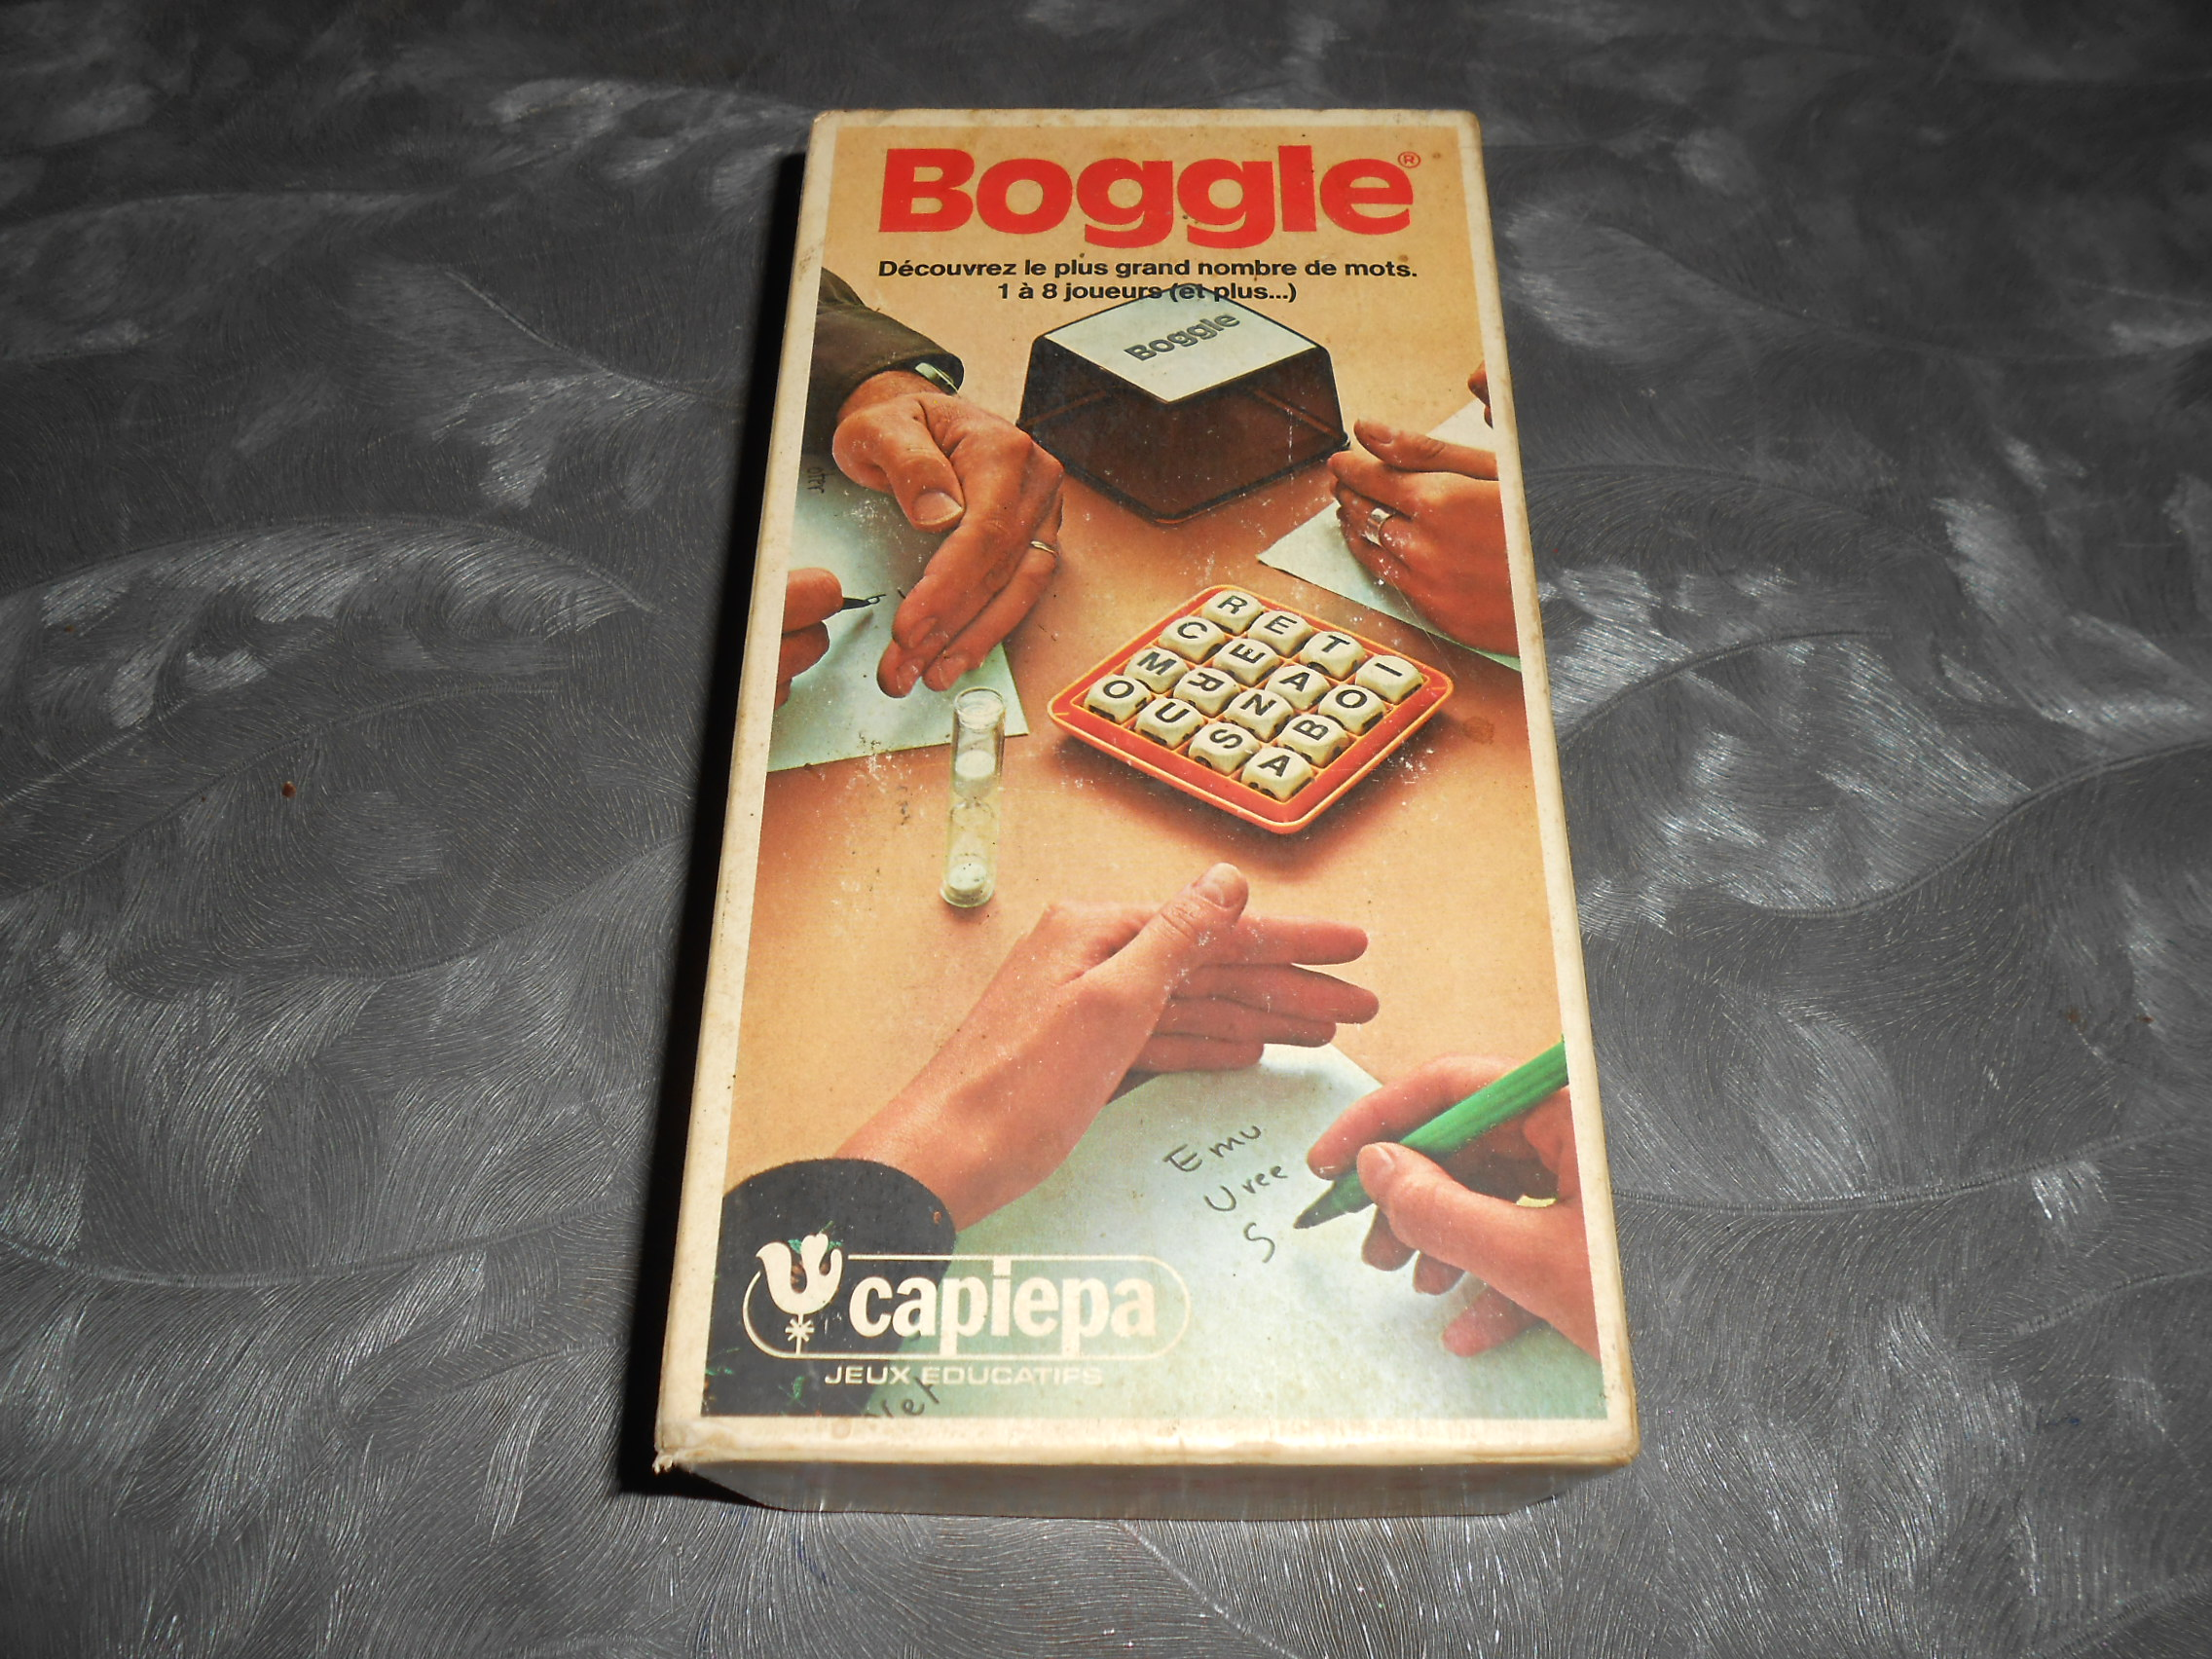 Boggle - Capiepa